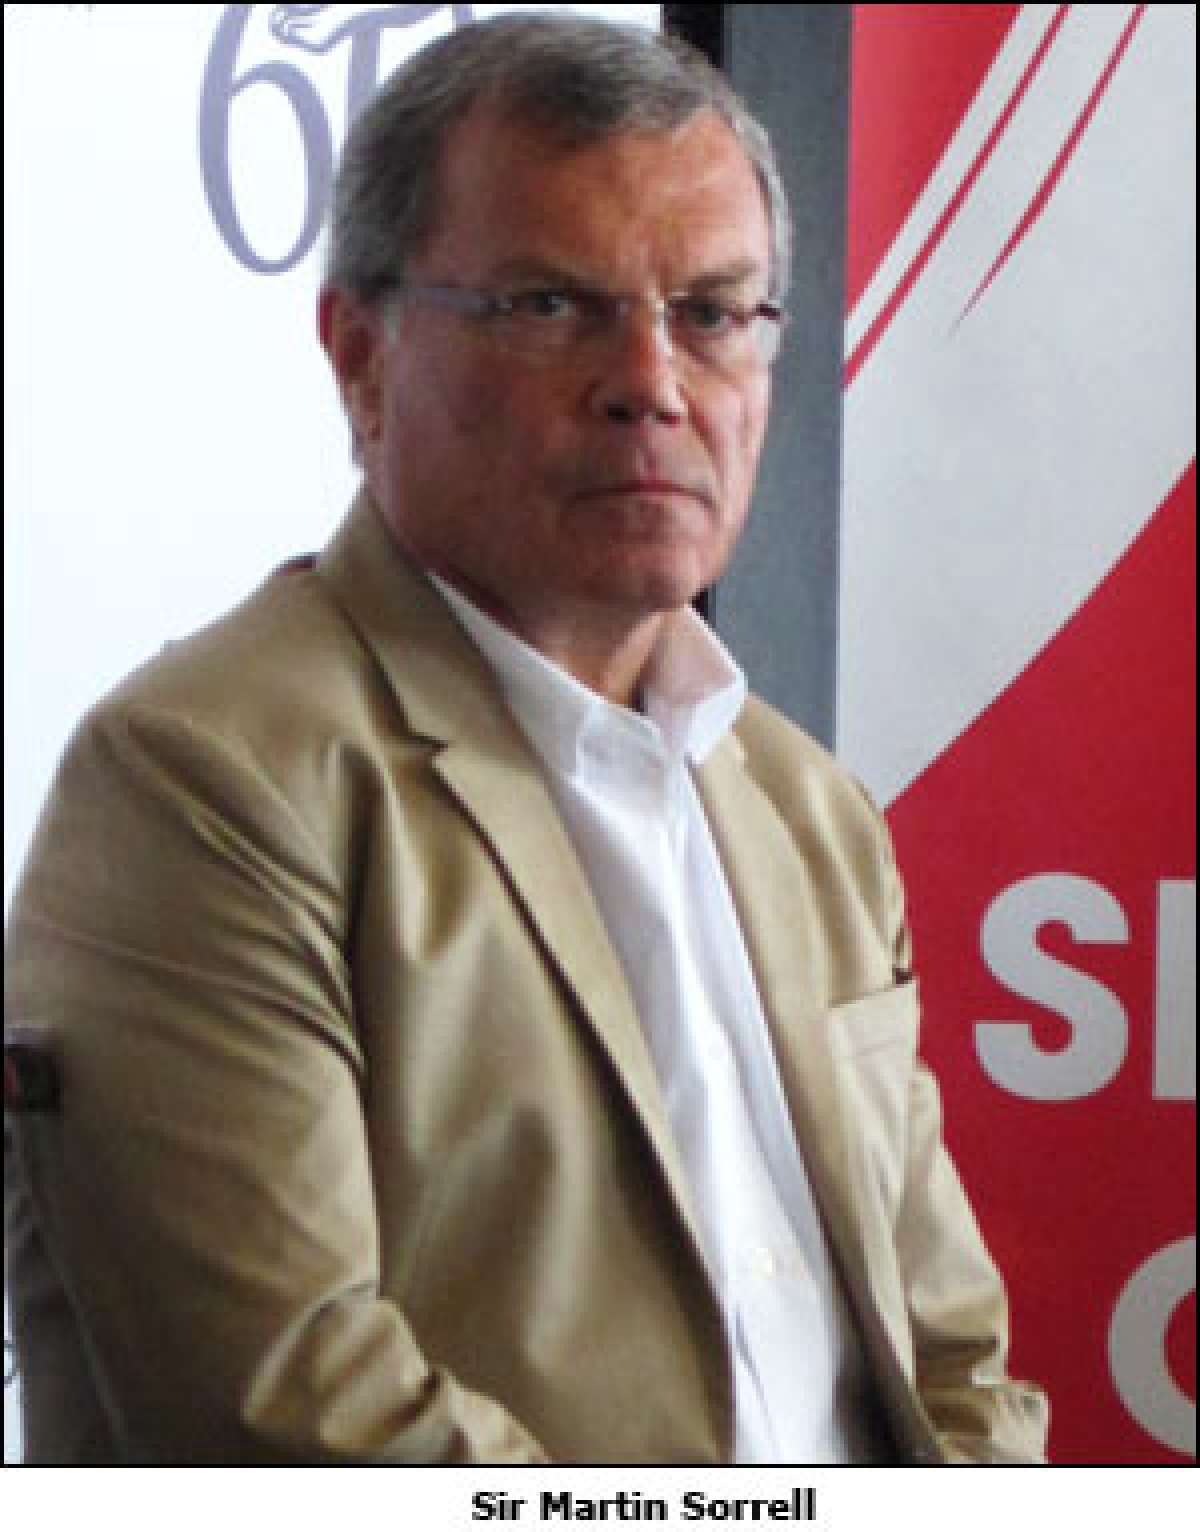 Cannes 2013: Cannes Debate-Sir Martin Sorrell indulged Coke honchos